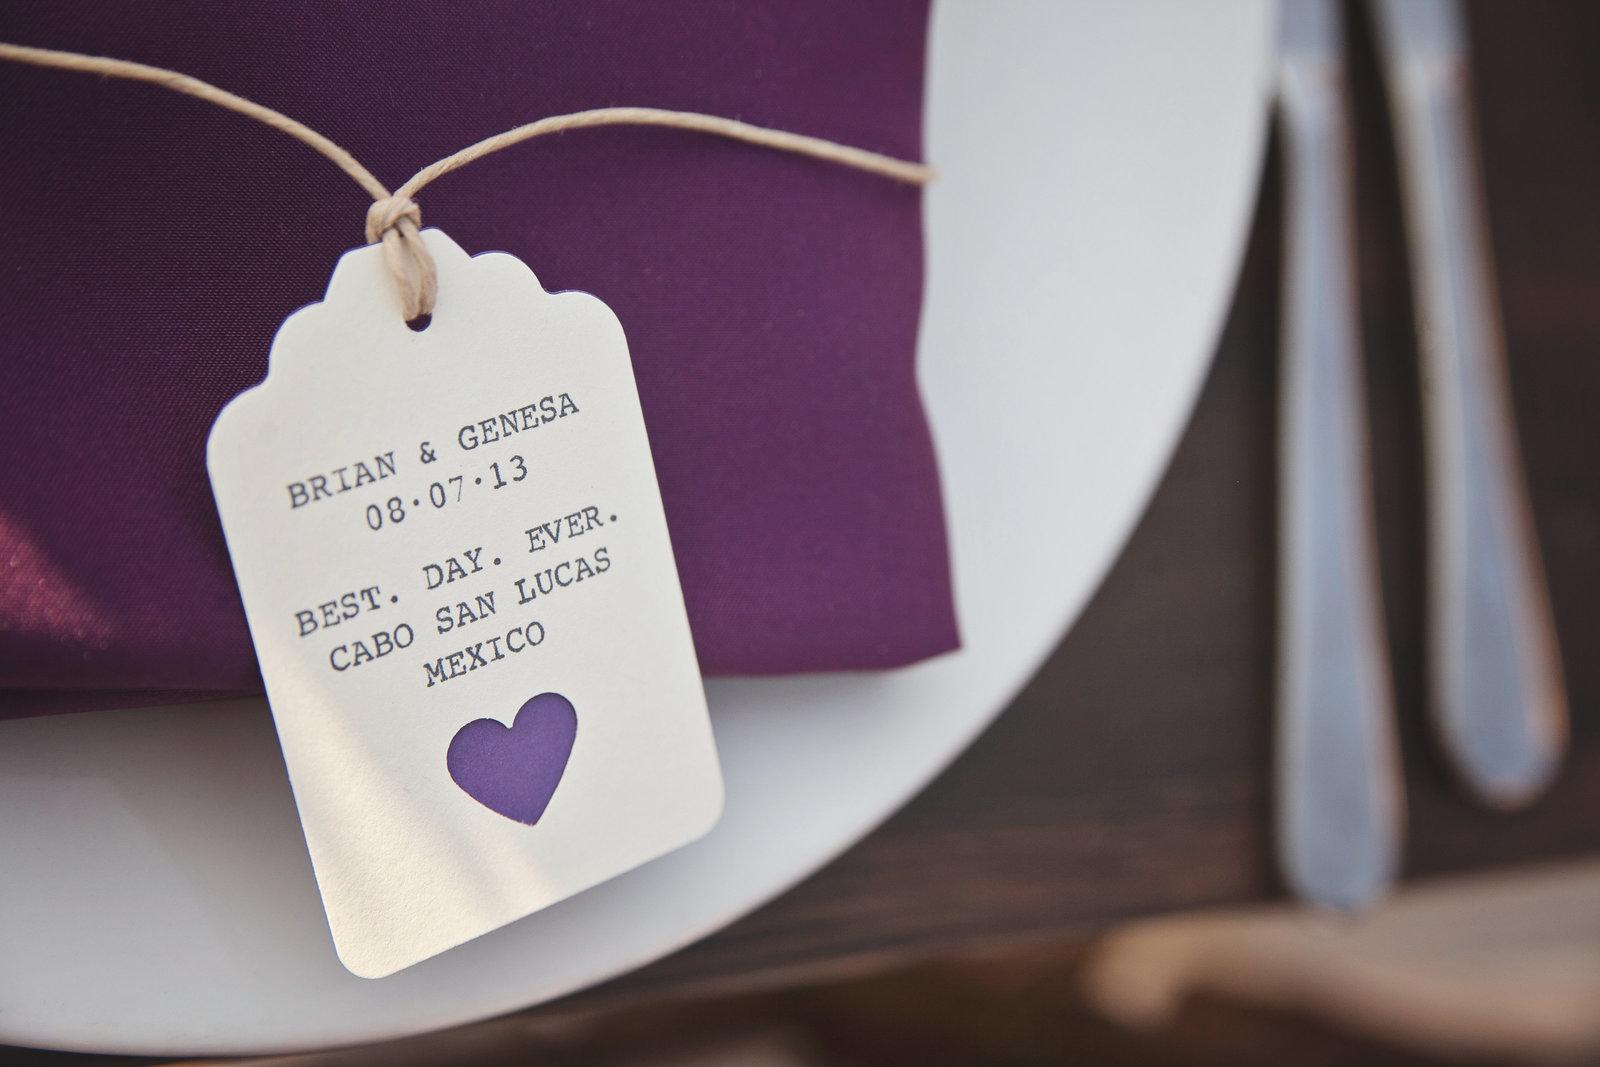 genesa-brian-cabo-destination-wedding500